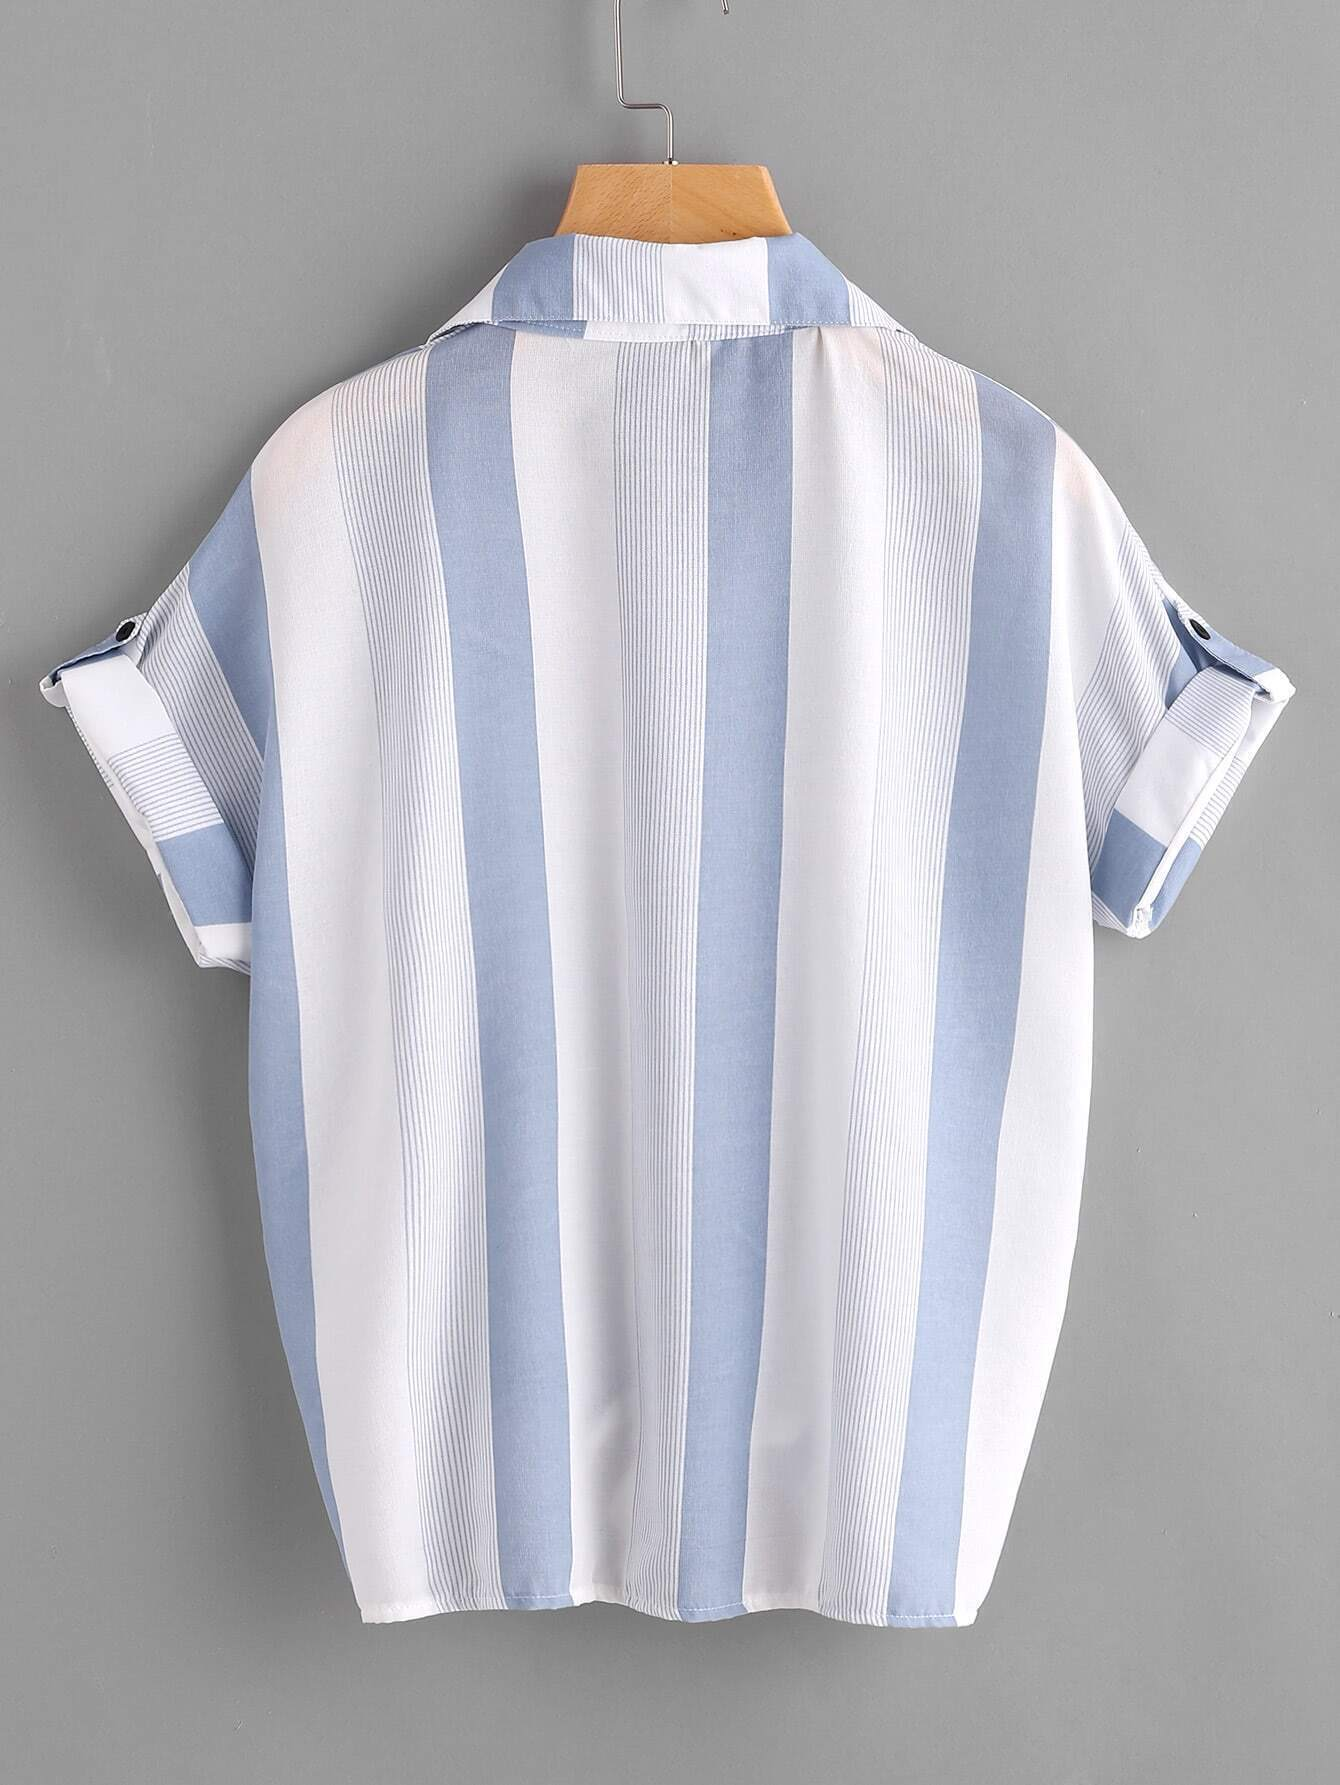 blouse170405006_2